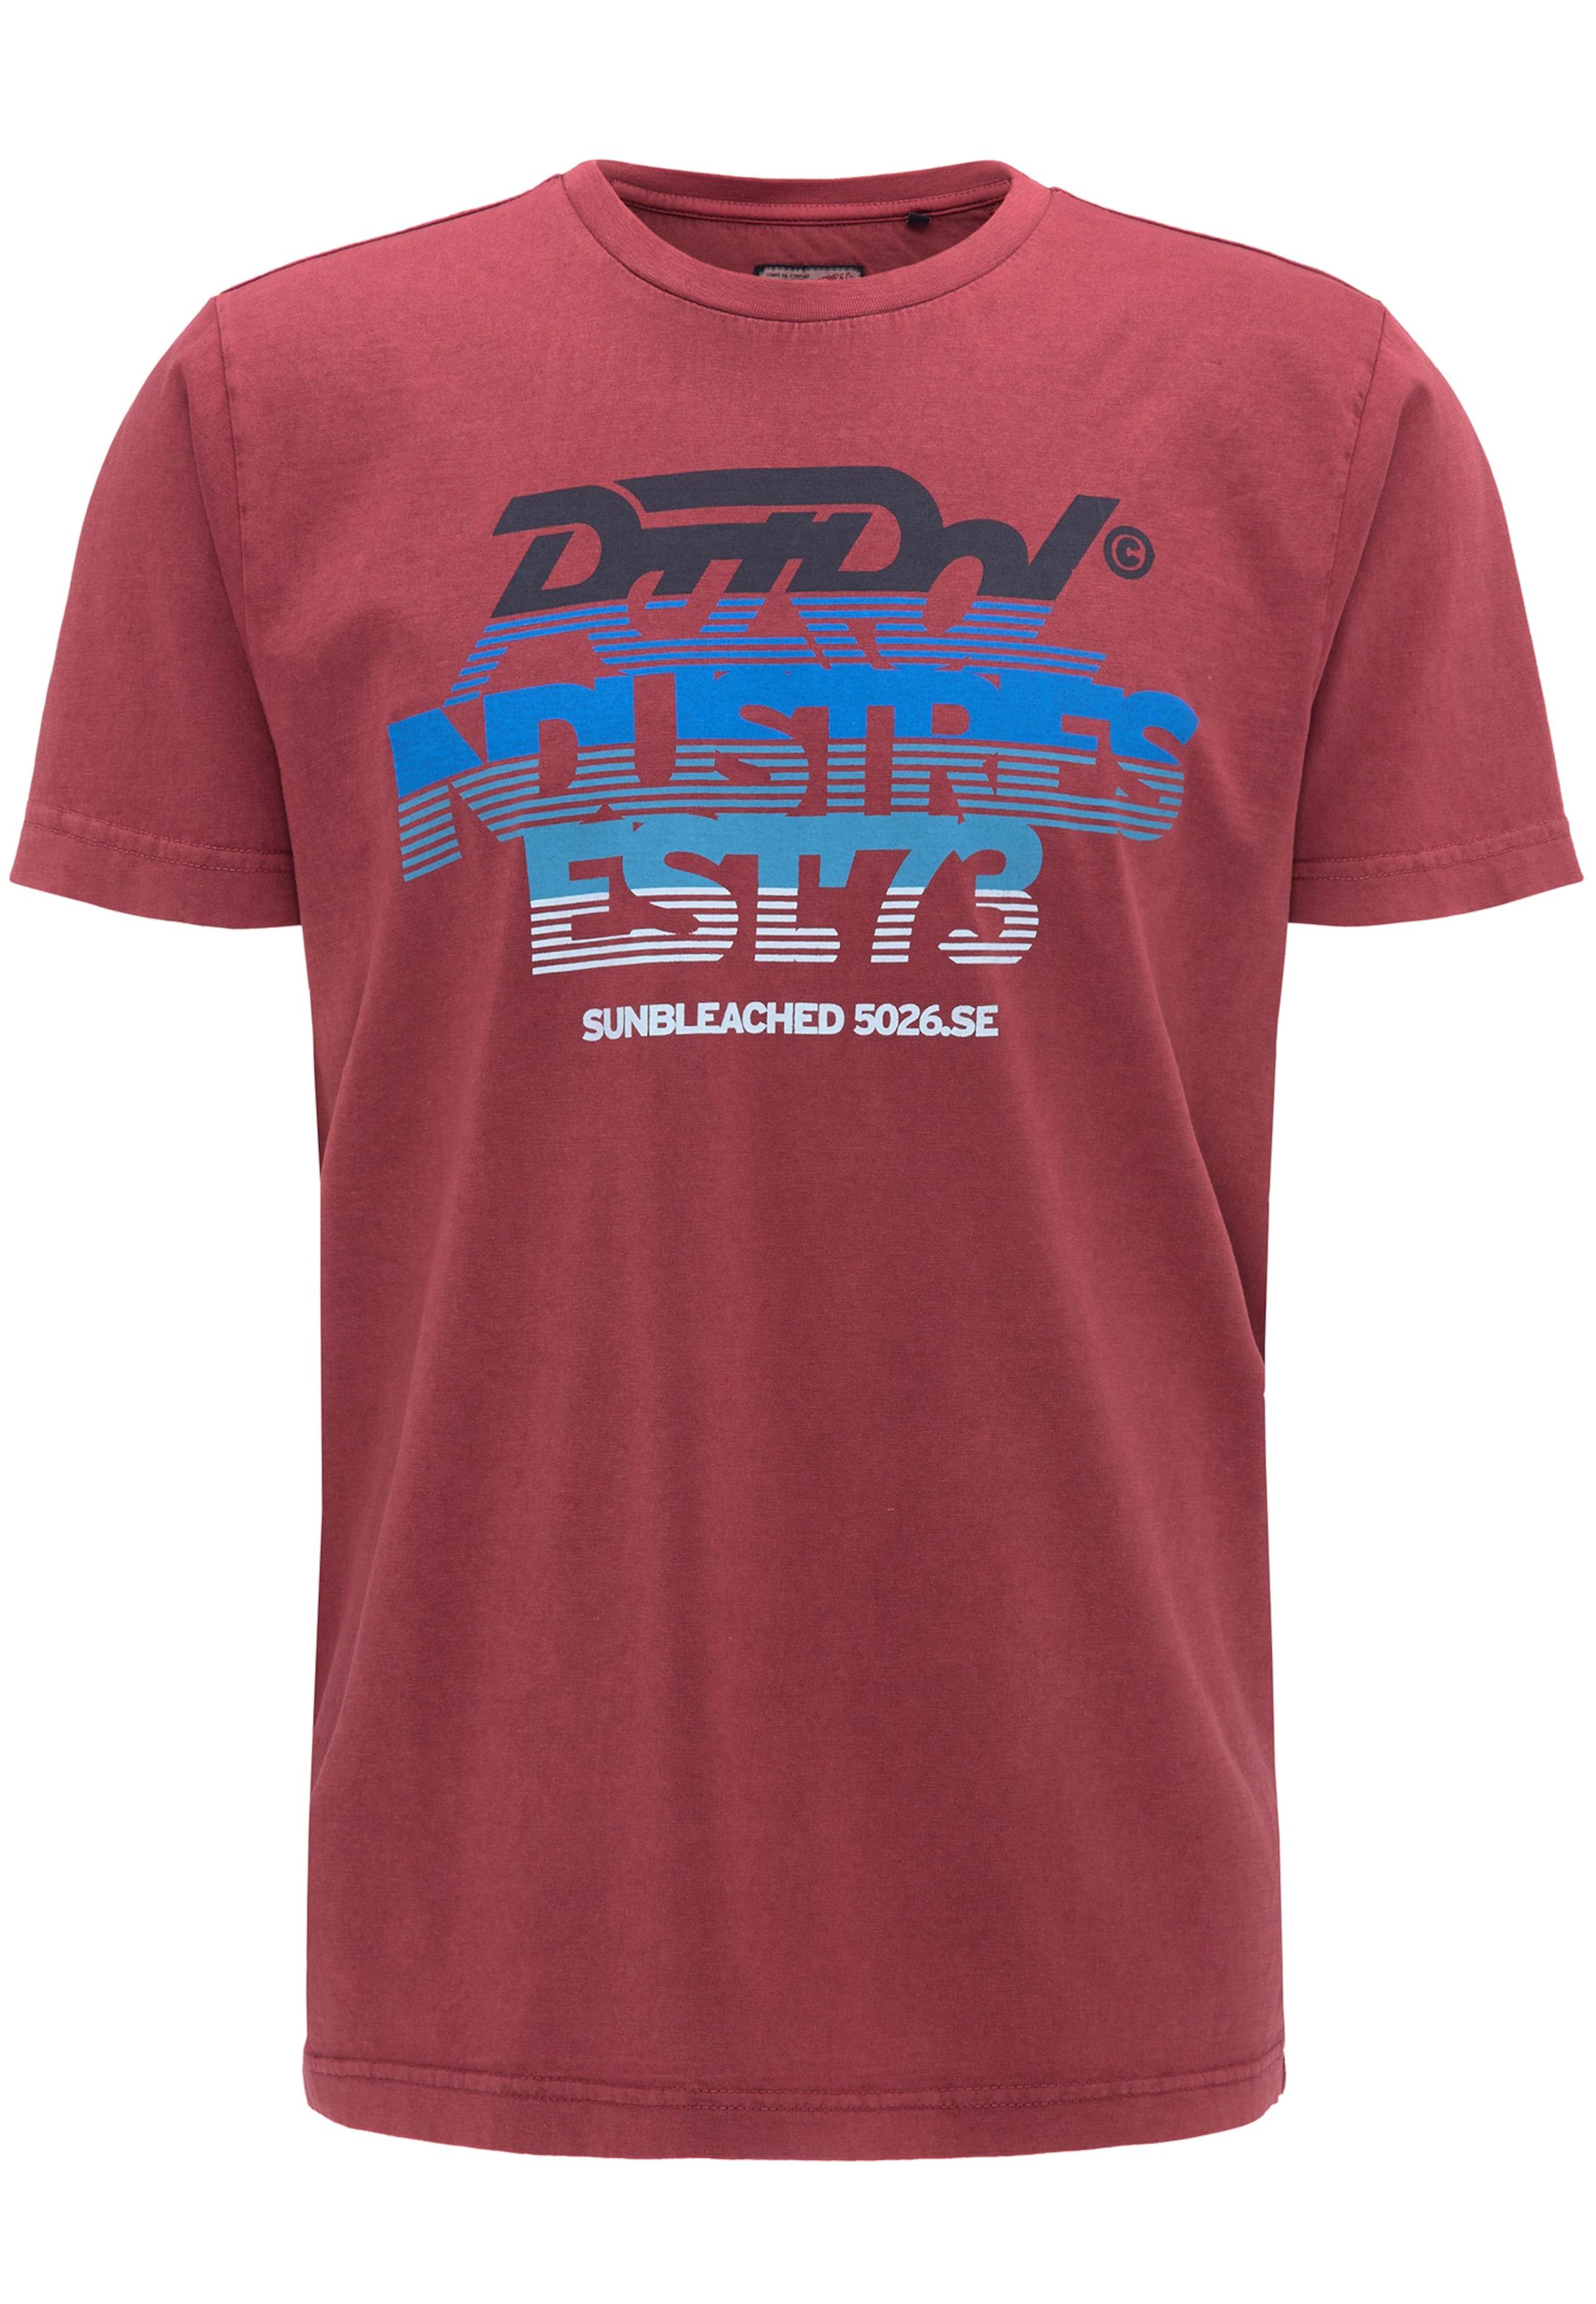 T Industries shirt BlauRot Petrol Schwarz In TJ3FlK1c